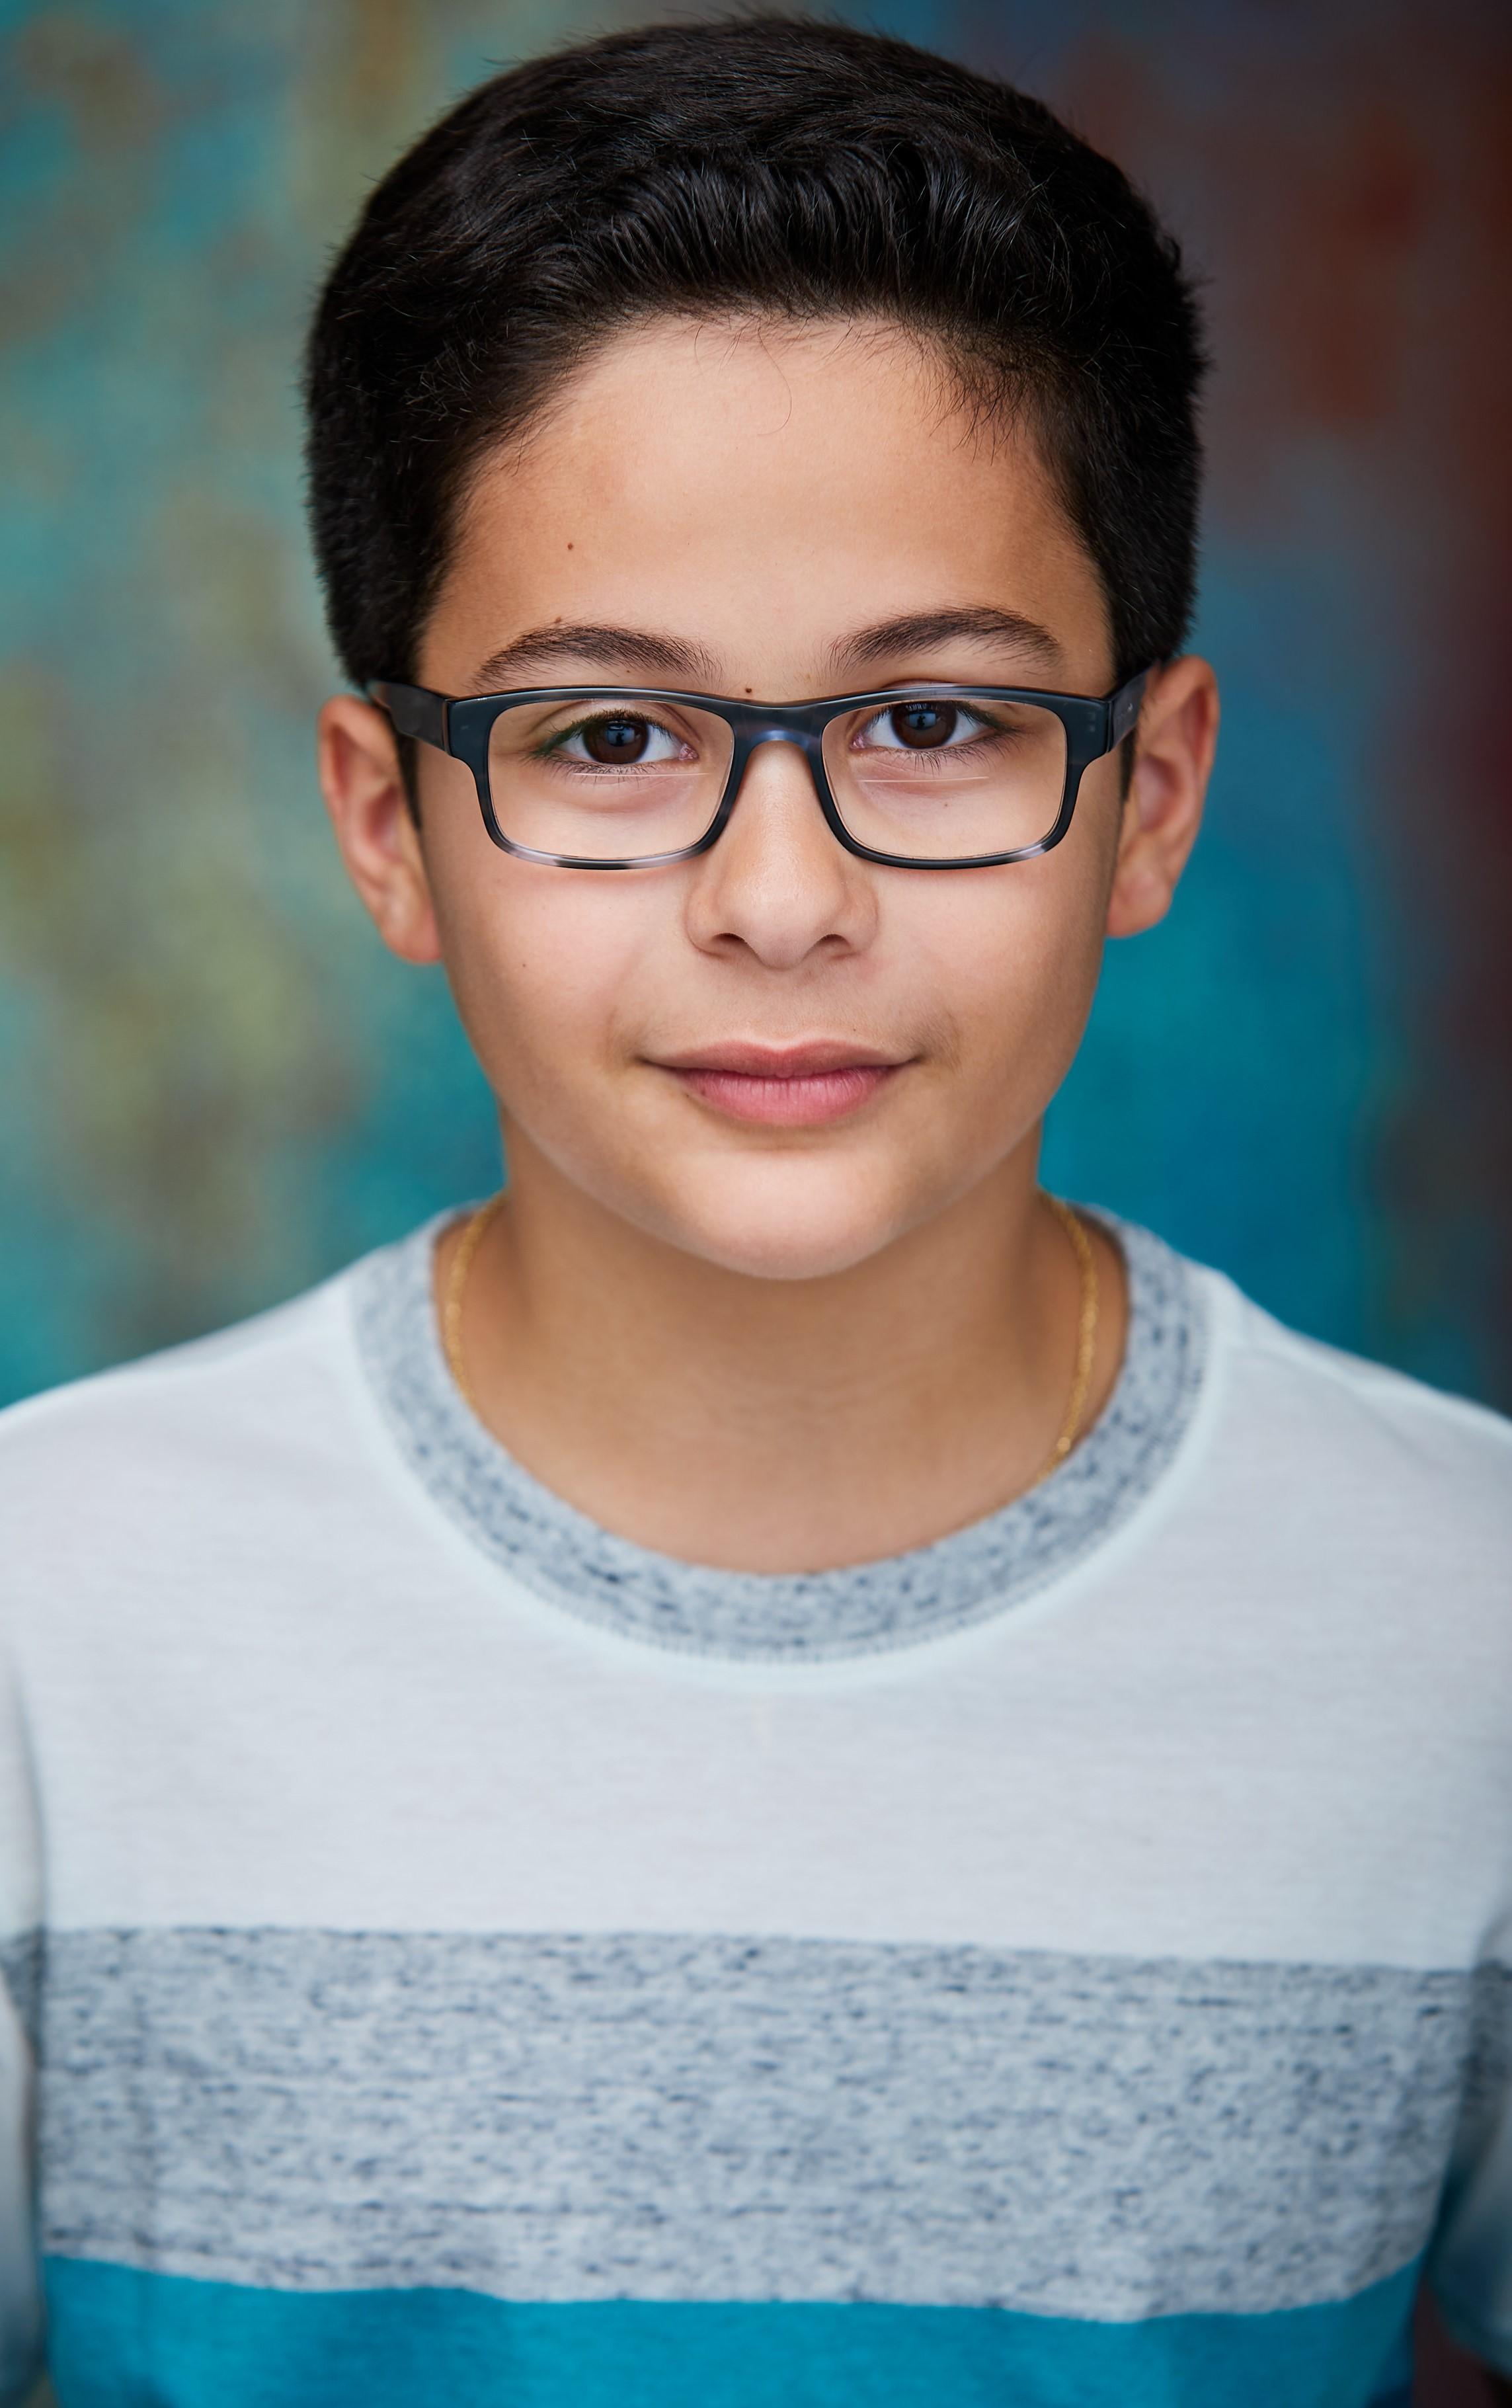 Michael Ramon - glasses serious.jpg